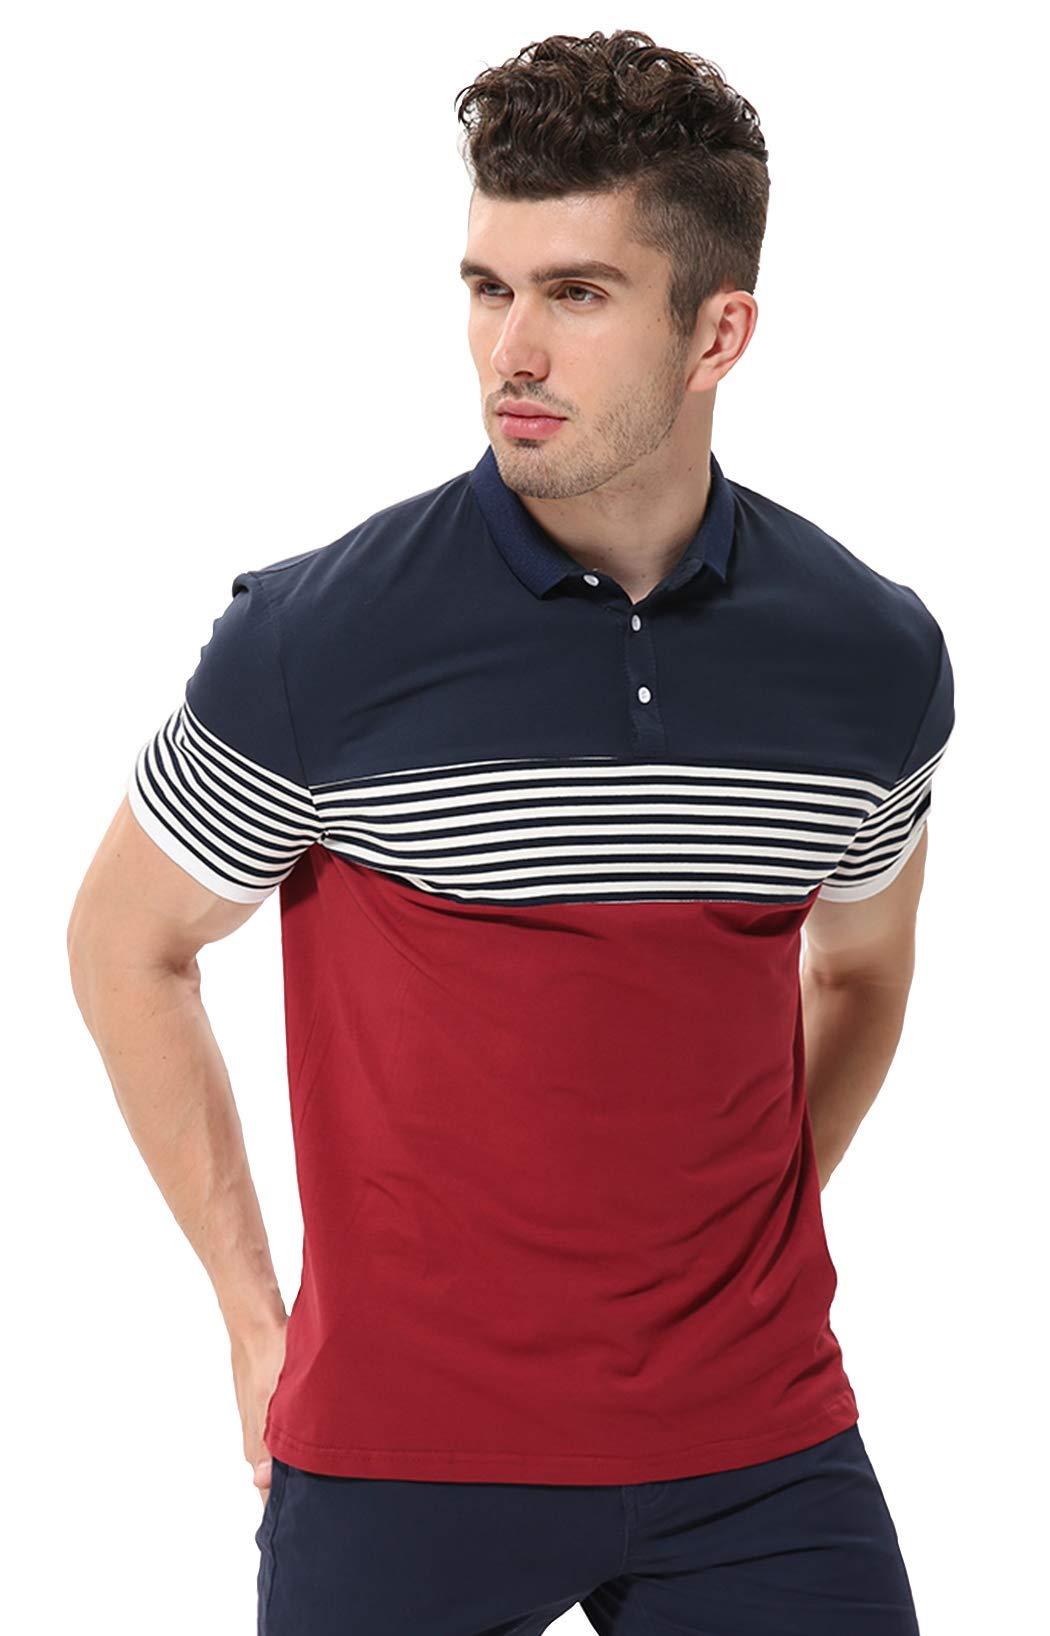 5f8db9dabd9 fanideaz Men s Cotton Red Half Sleeve Striped Polo T Shirt with Collar